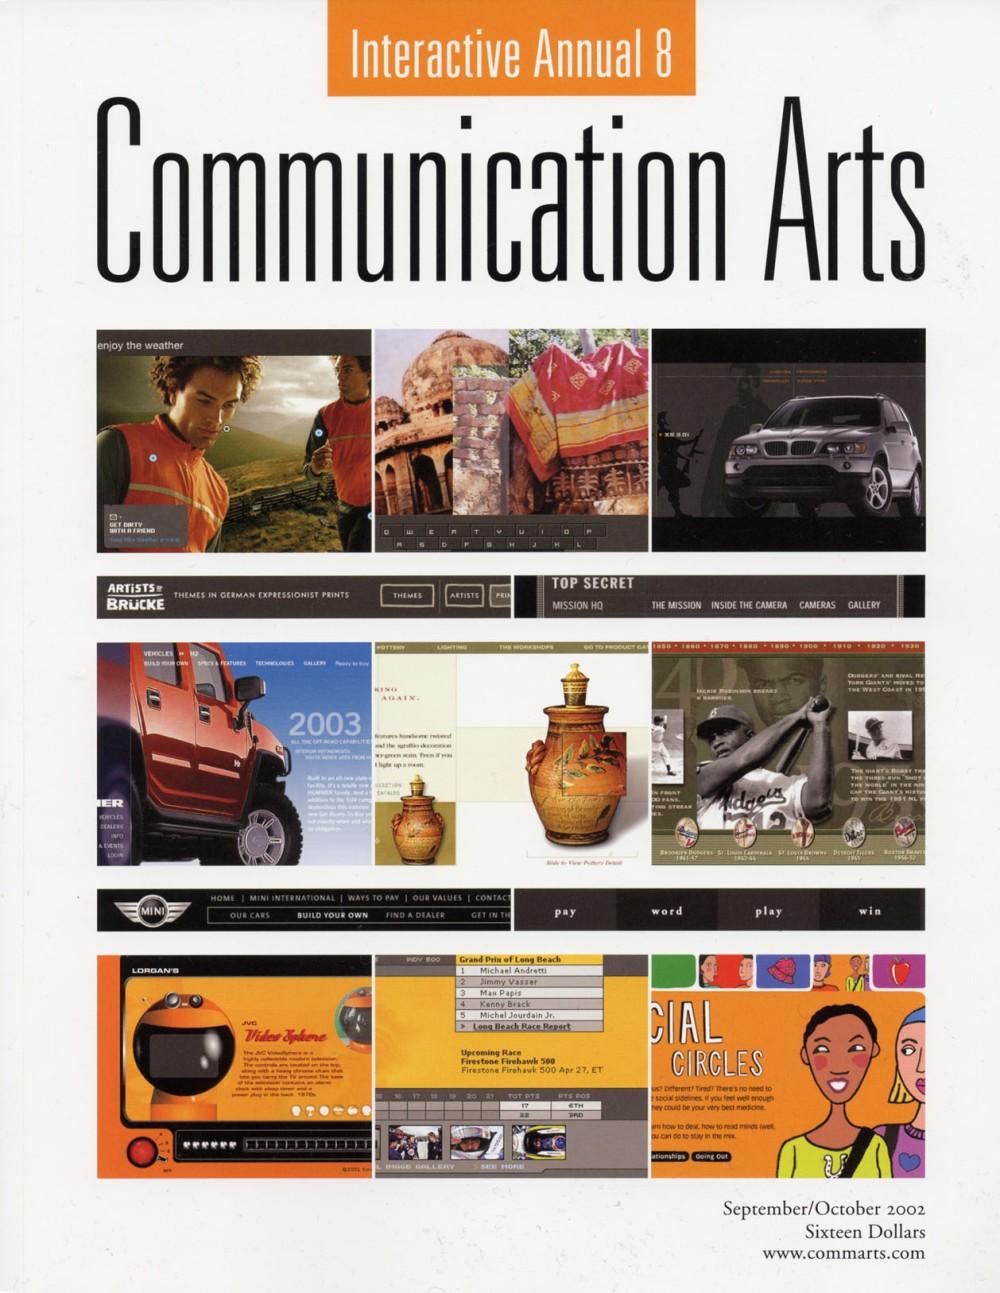 communicationarts_cover